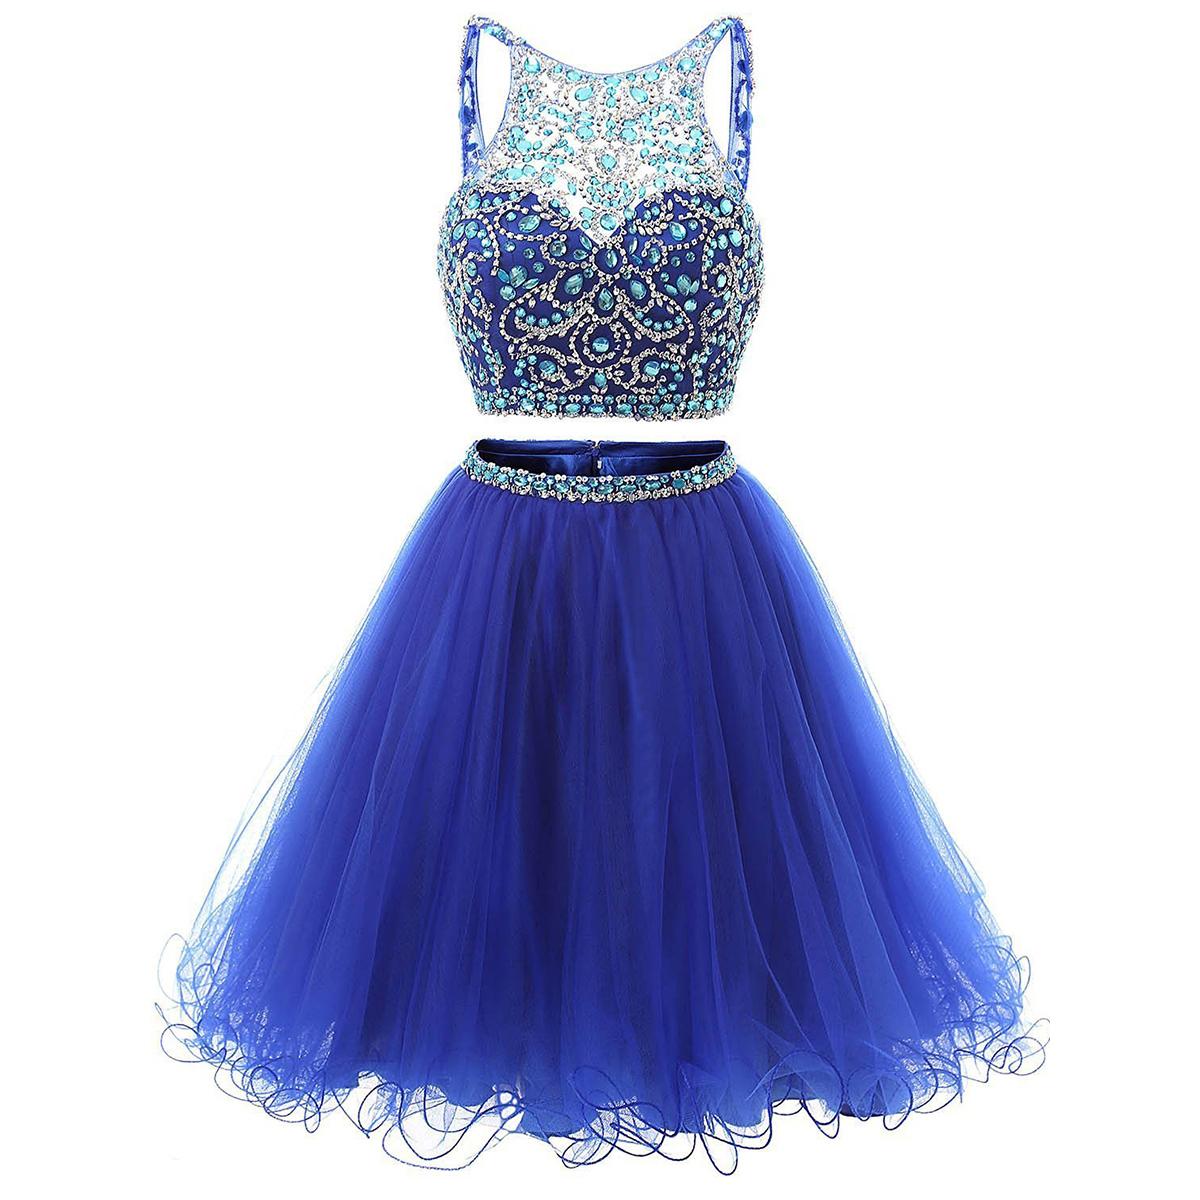 04e9d1d9eb Jewel Neck Illusion Sequins Crystal Prom Dress